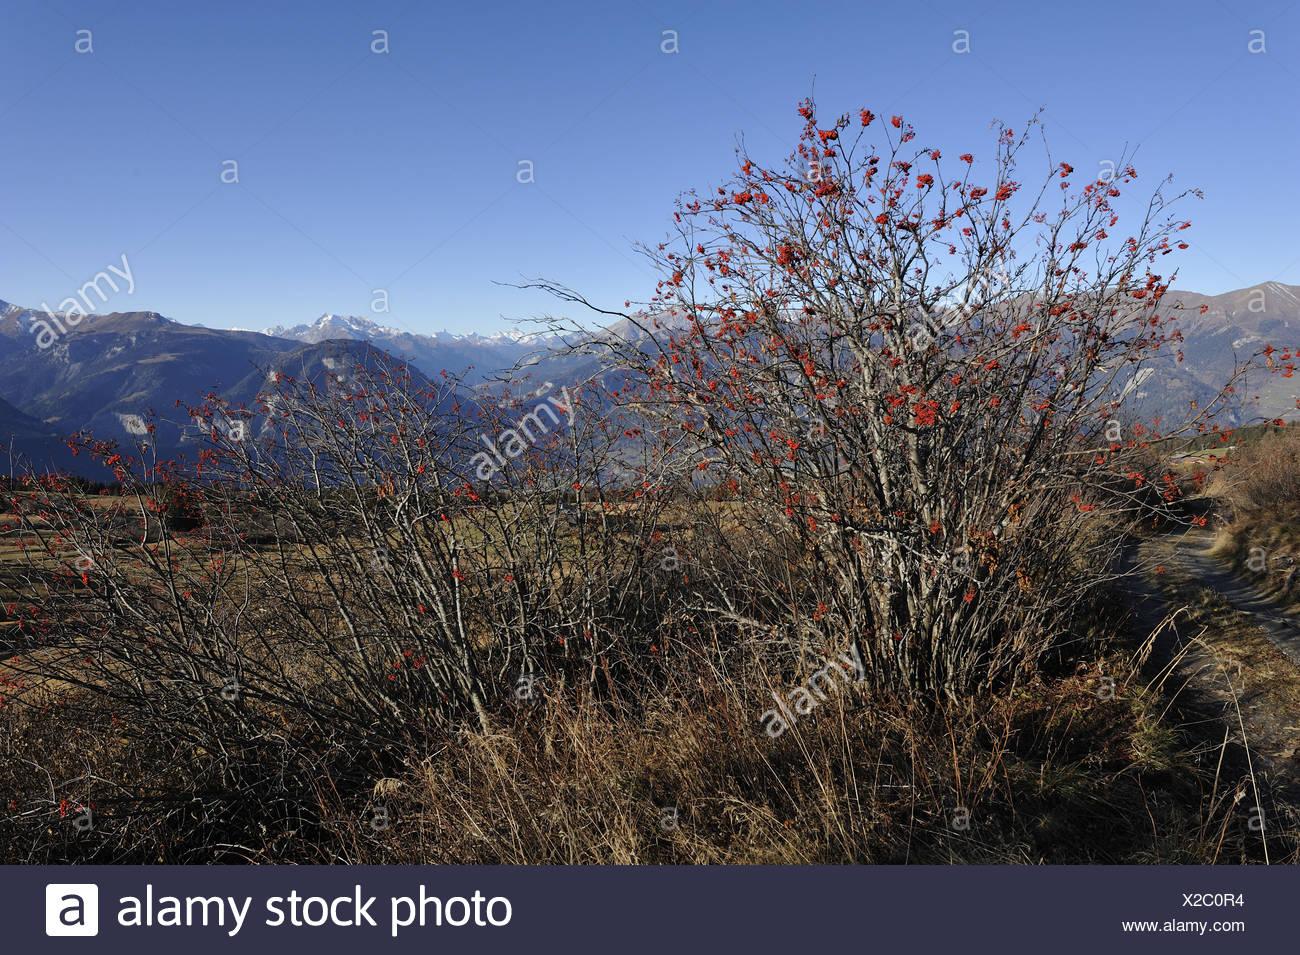 Mountain Ash, Sorbus aucuparia, tree, plant, Rosaceae, Heinzenberg, Canton, Grisons, Switzerland - Stock Image